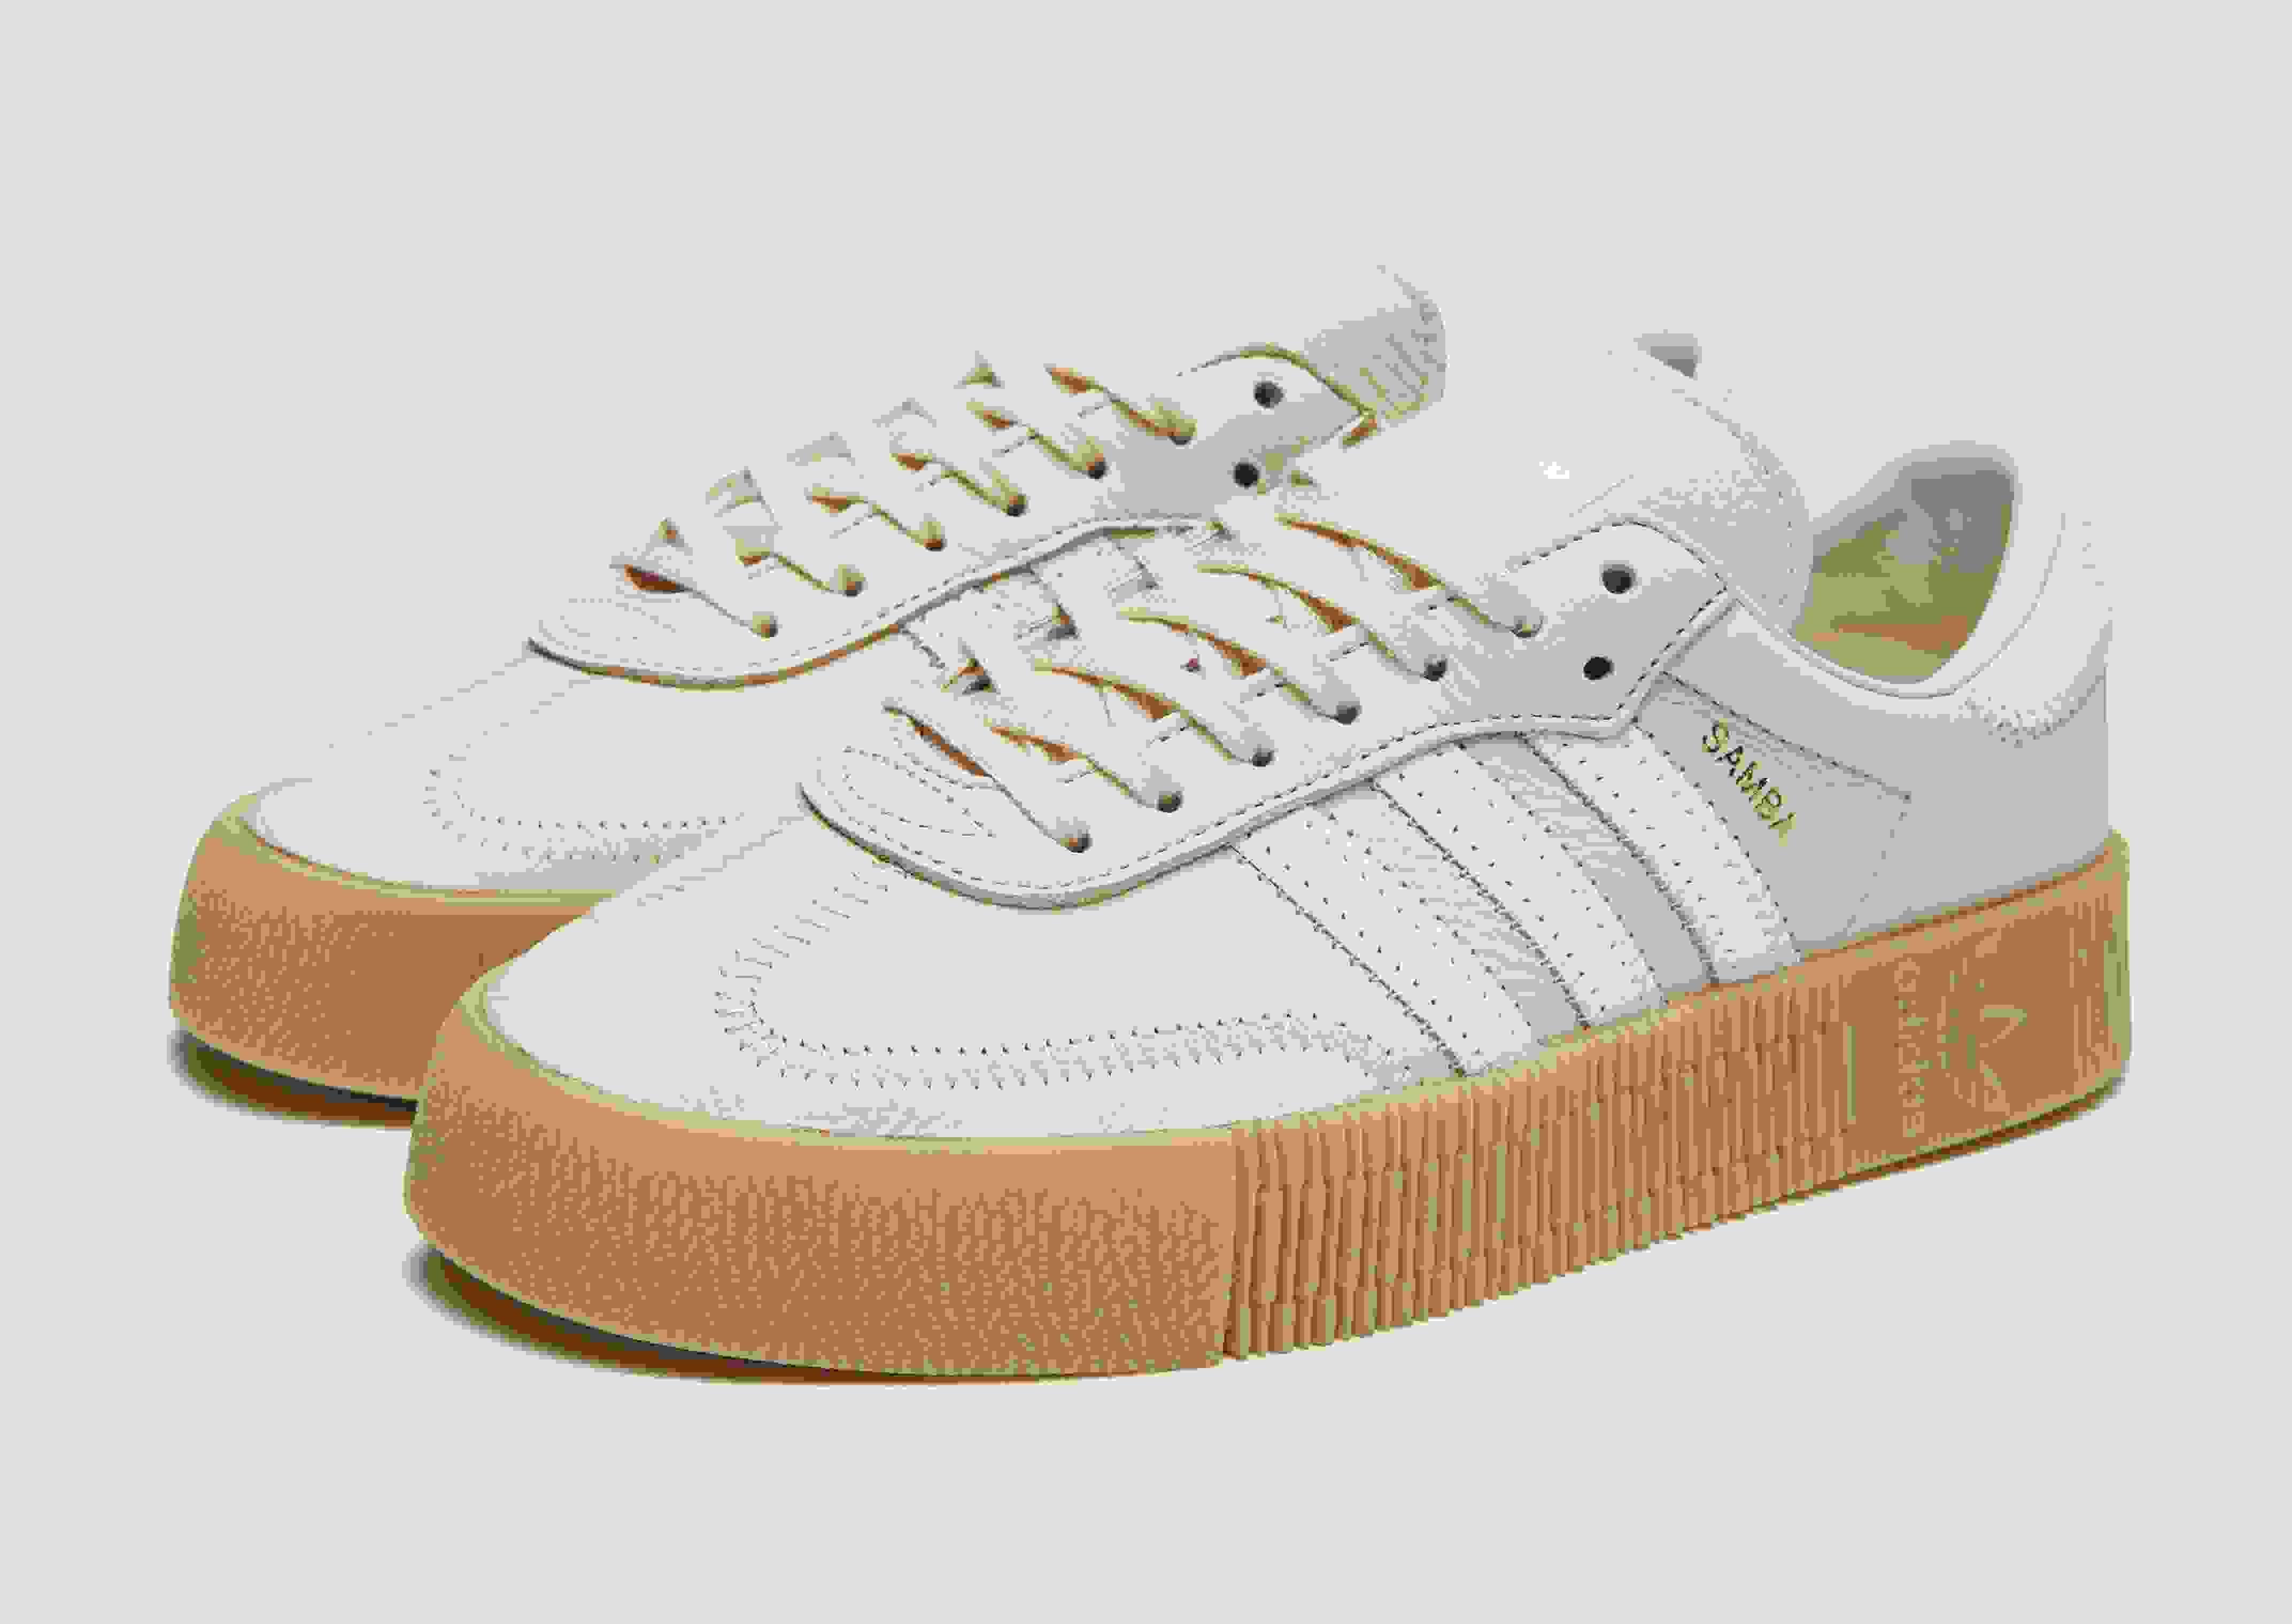 124490c1410c Adidas Samba Rose Womens Boots Sale Girls Size Women s Boots Sale ...